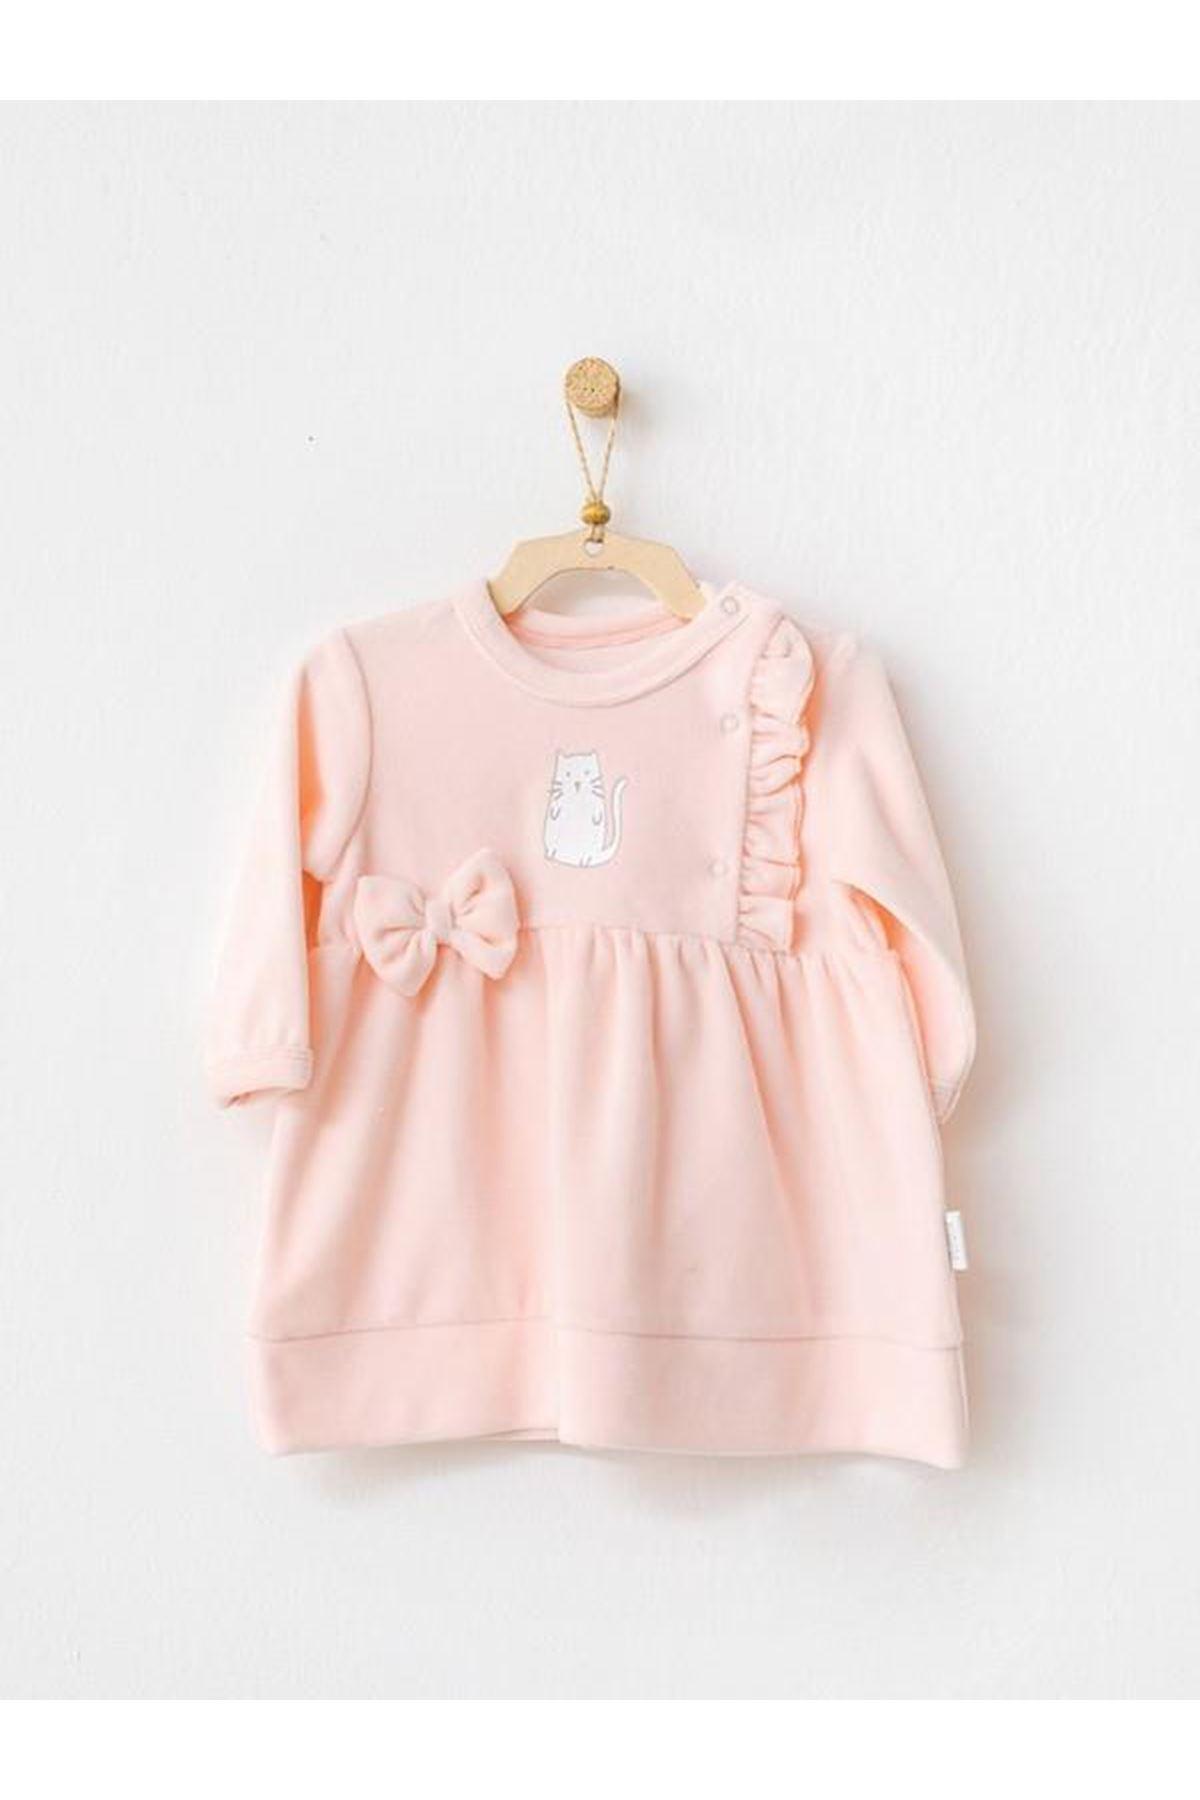 Andywawa AC21120 Meow Kadife Bebek Elbise Pink